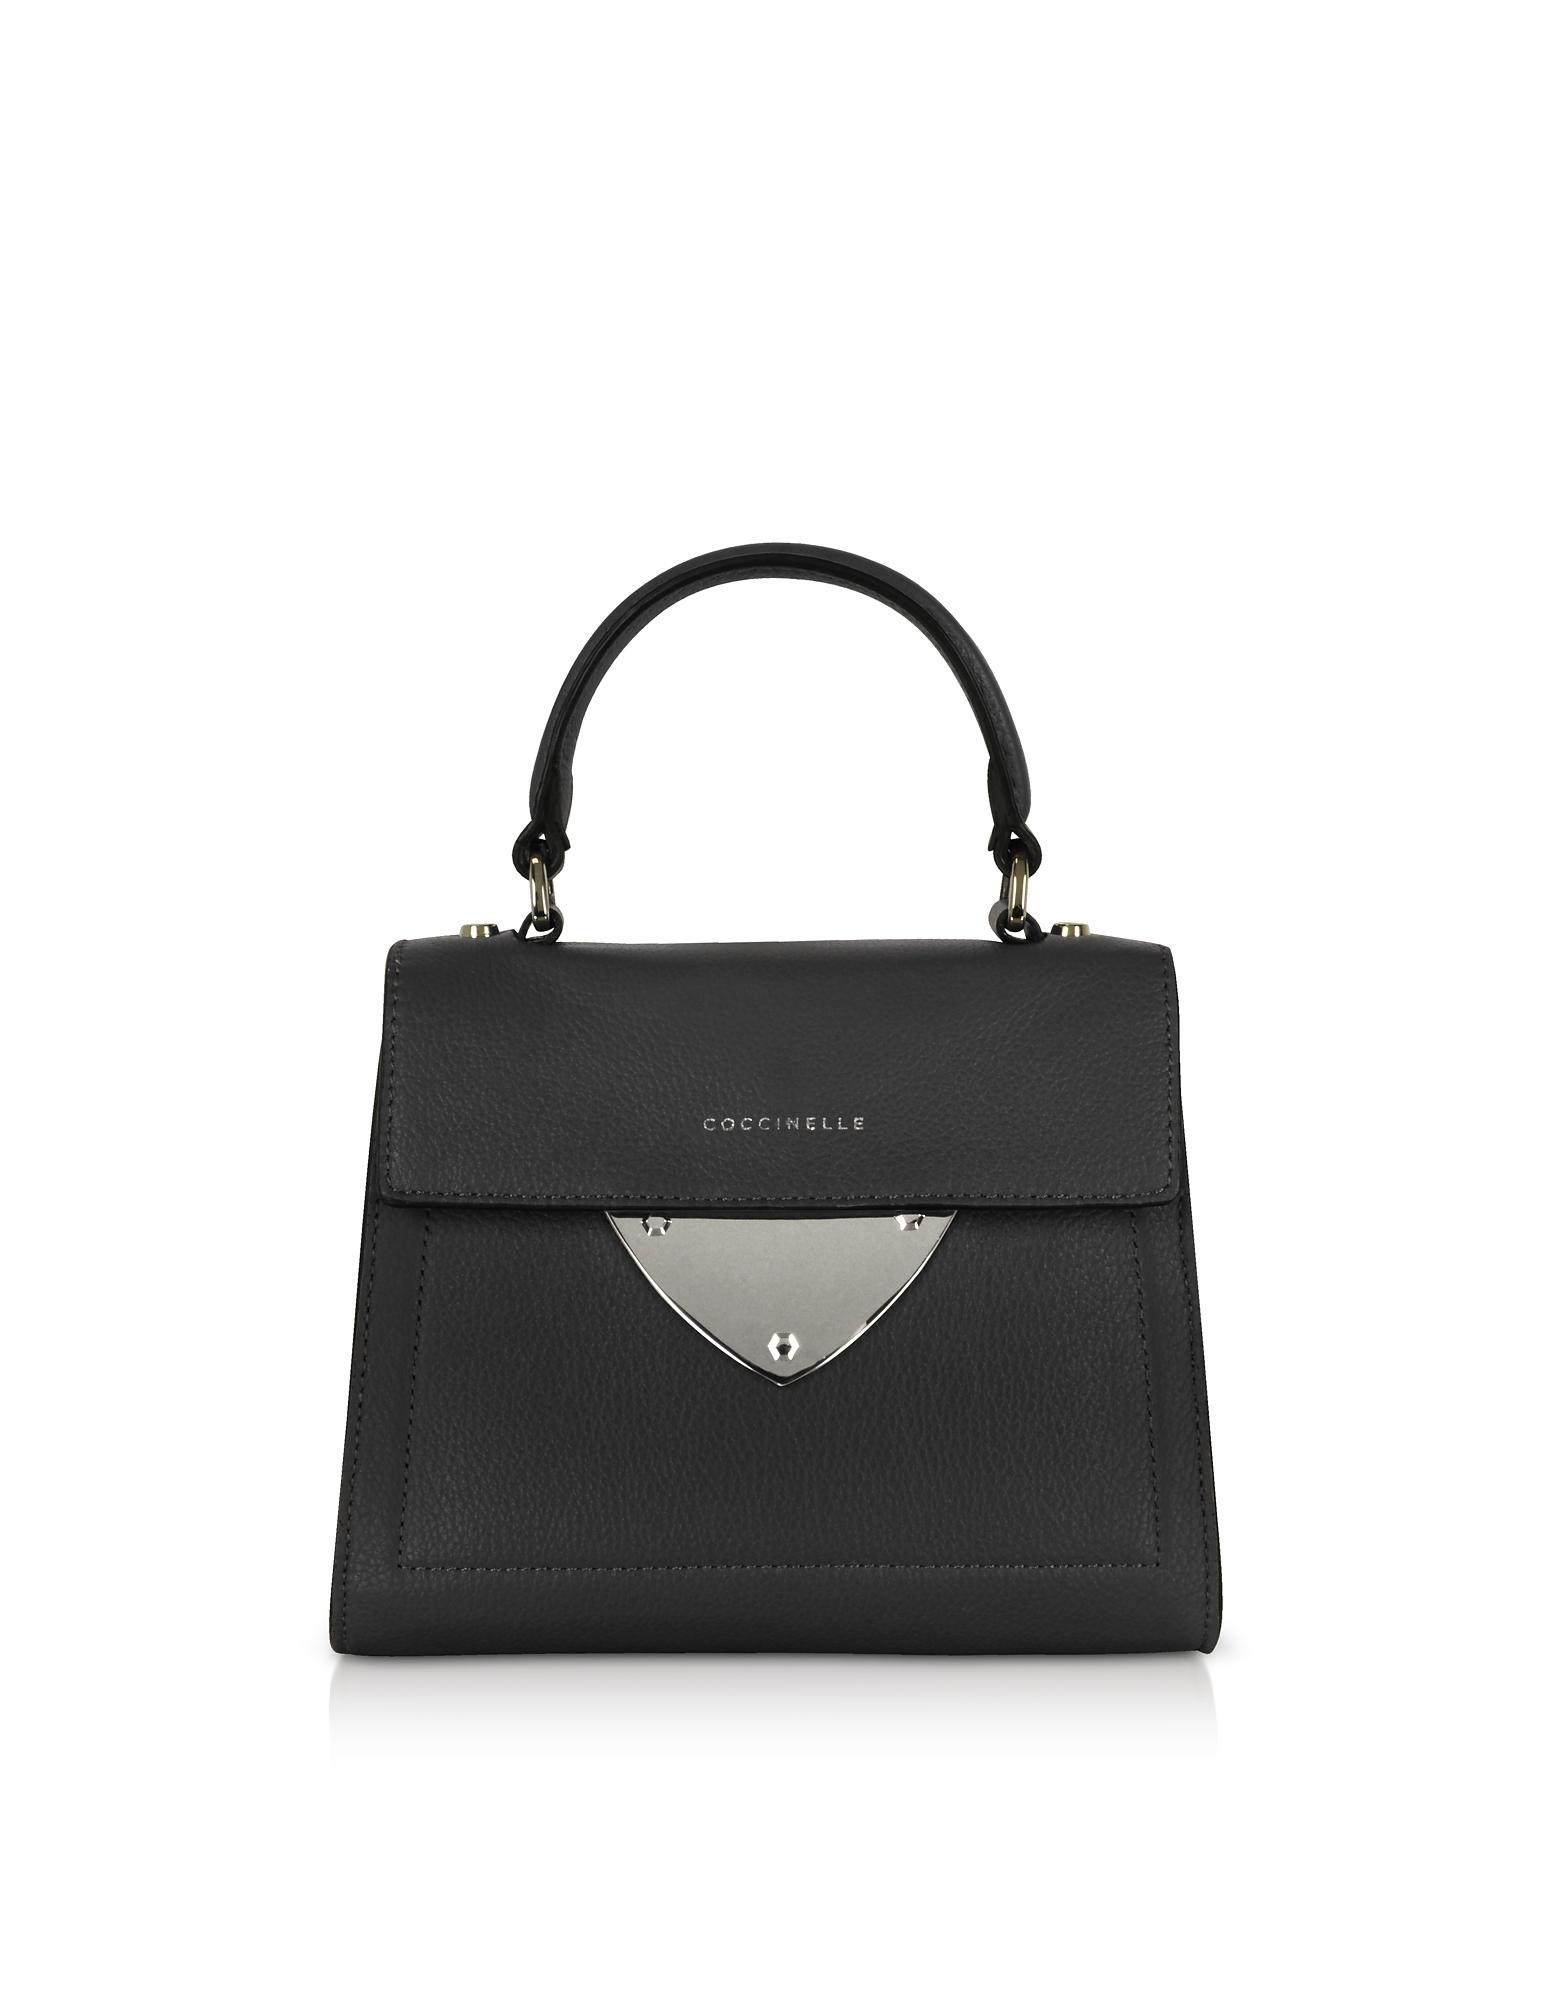 Image of Coccinelle Designer Handbags, B14 Mini Leather Satchel Bag